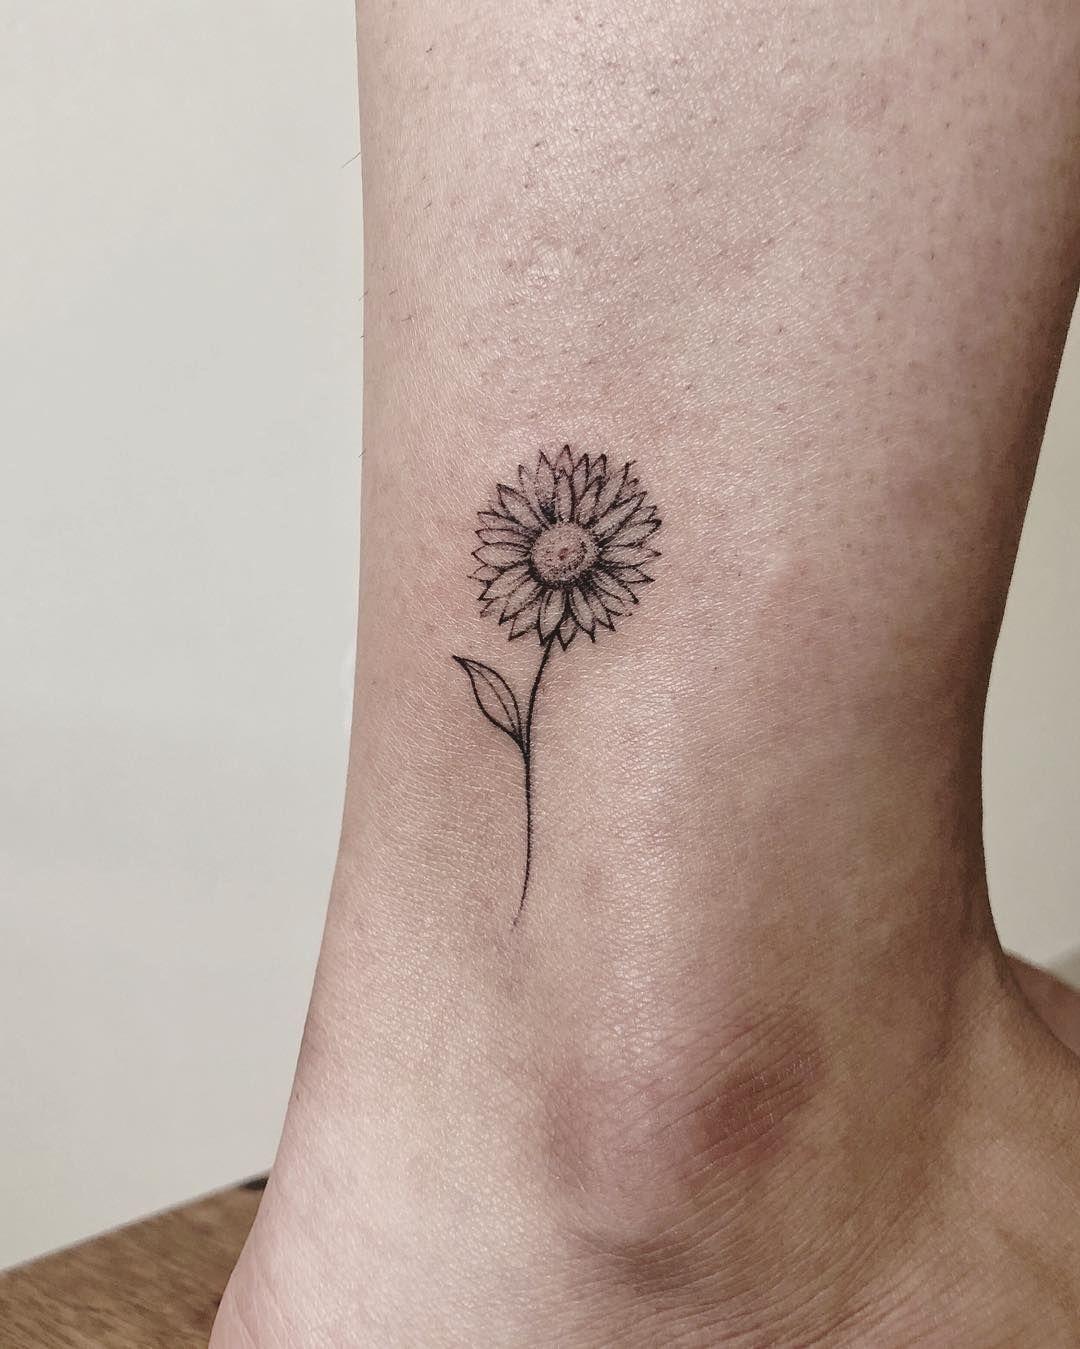 Sunflower Tattoo Minimalist